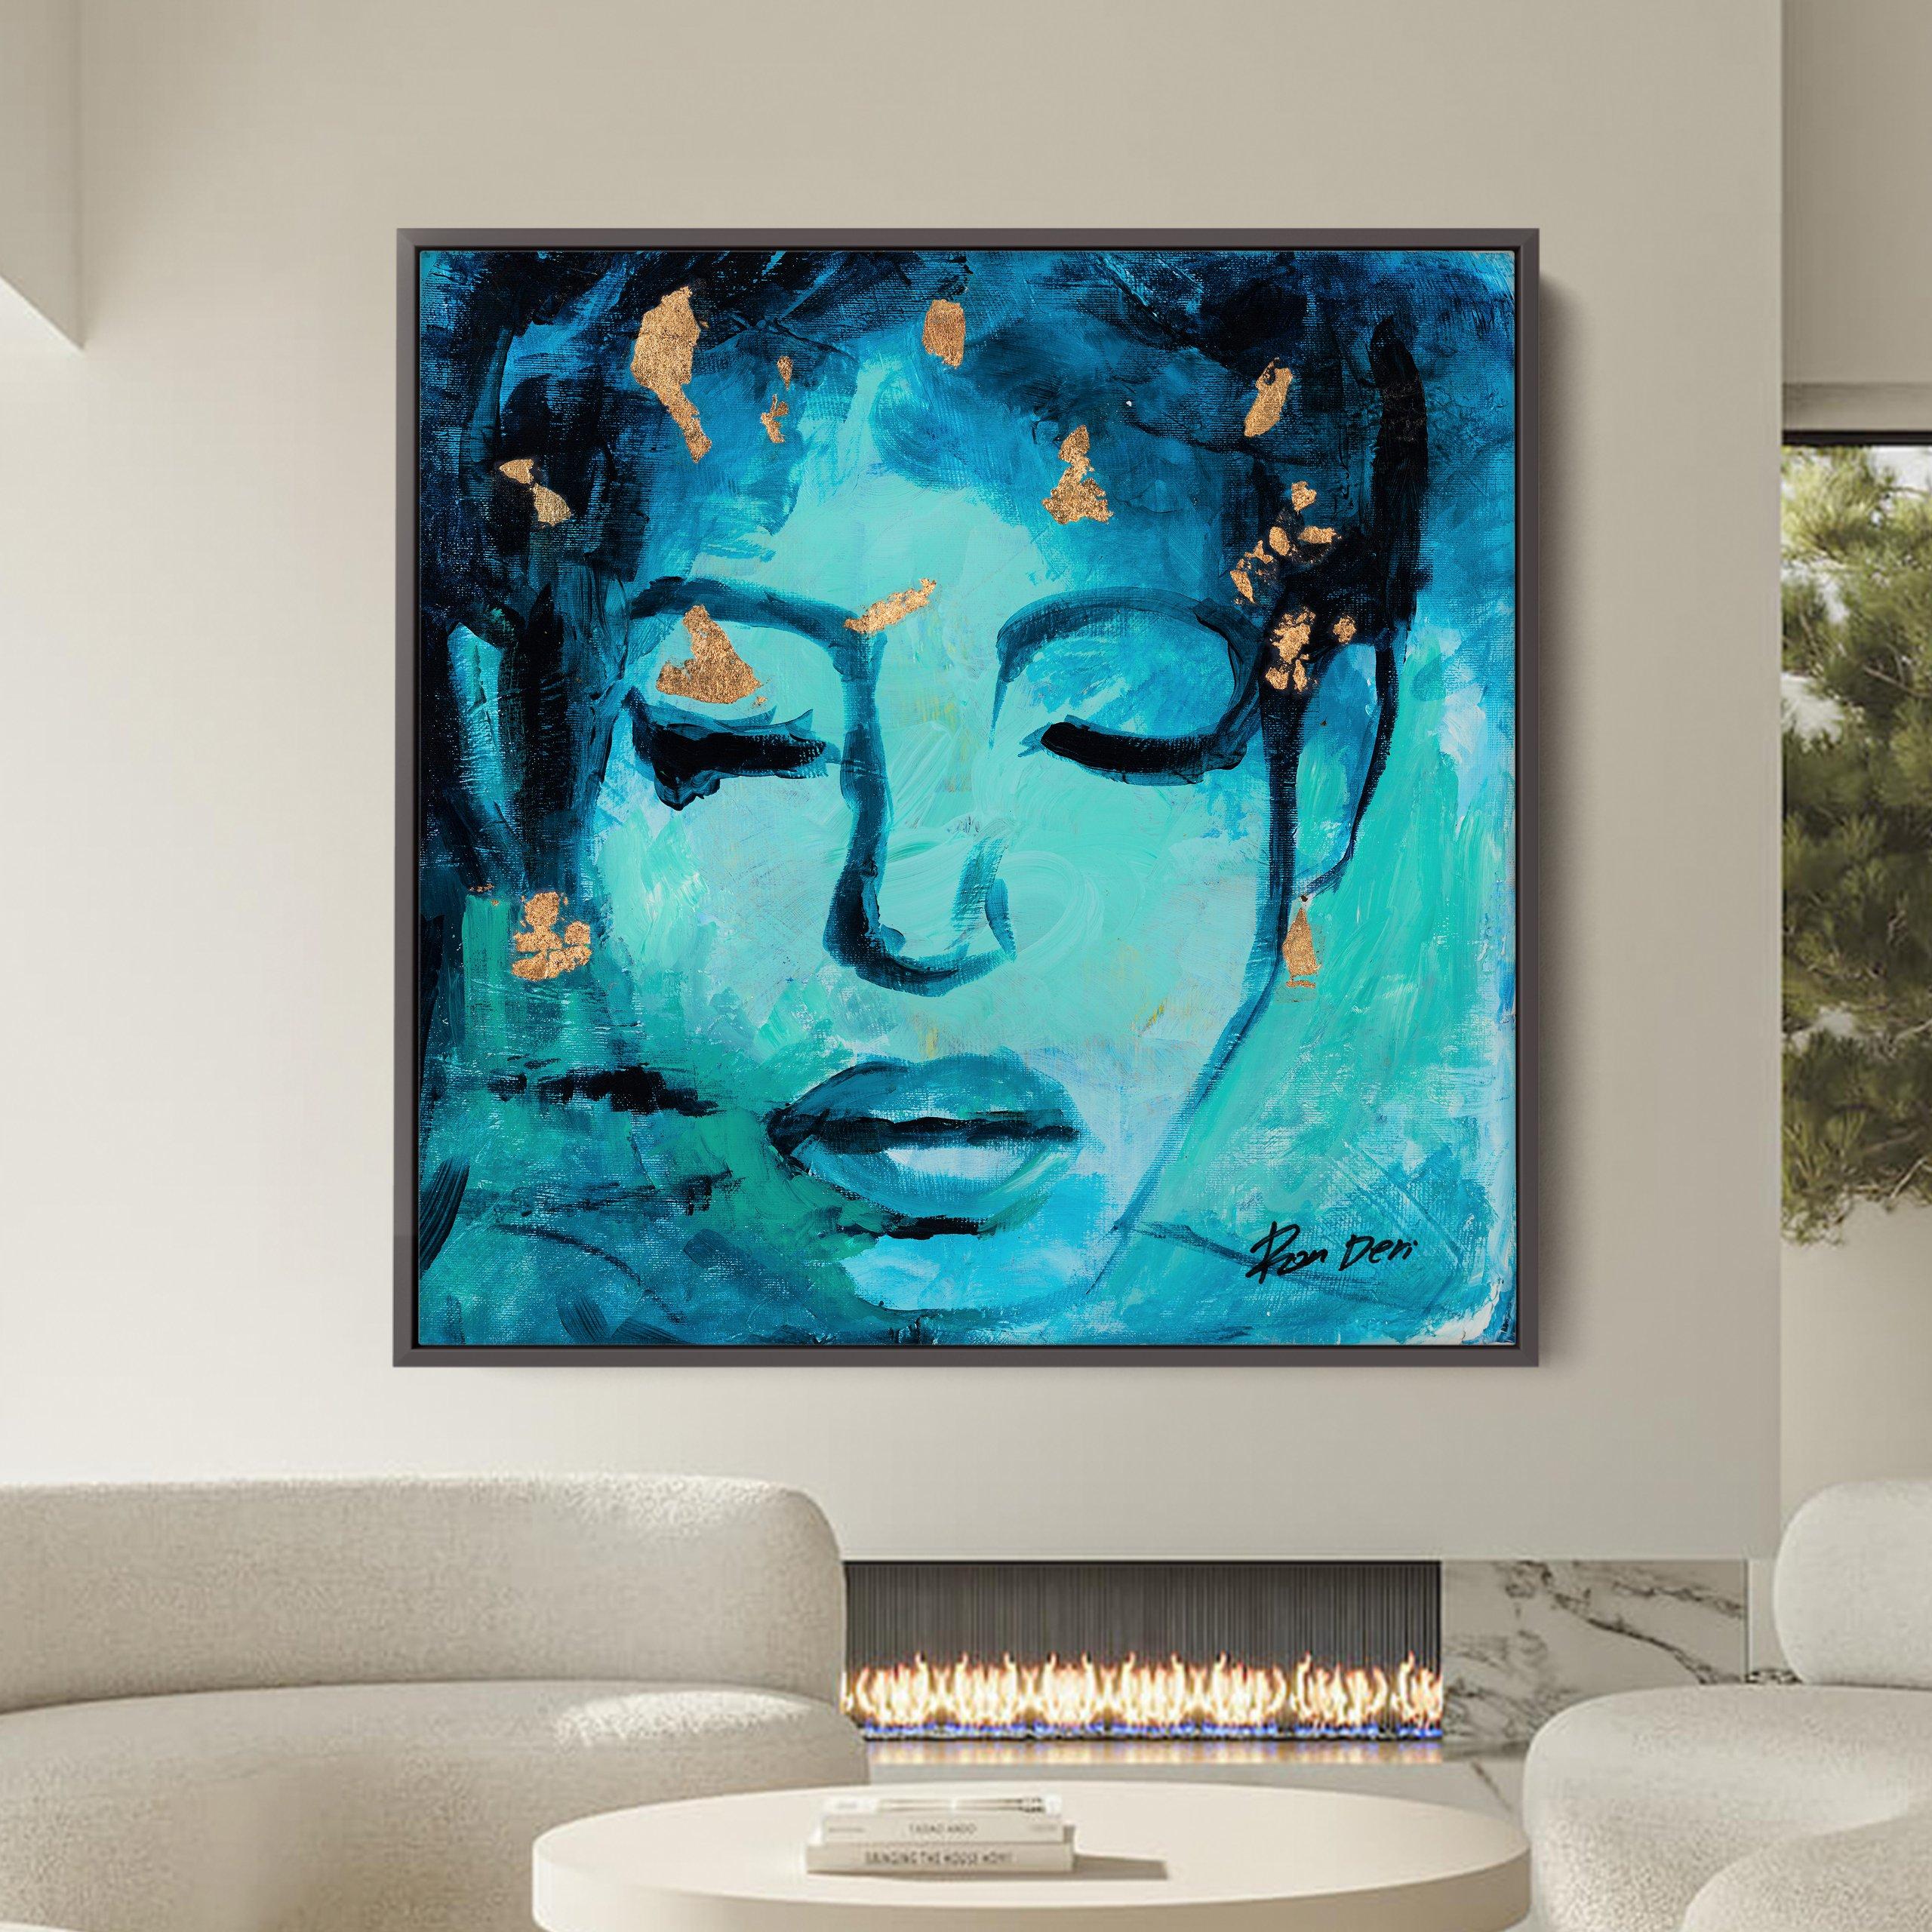 Believe-ron-deri-painting-on-canvas